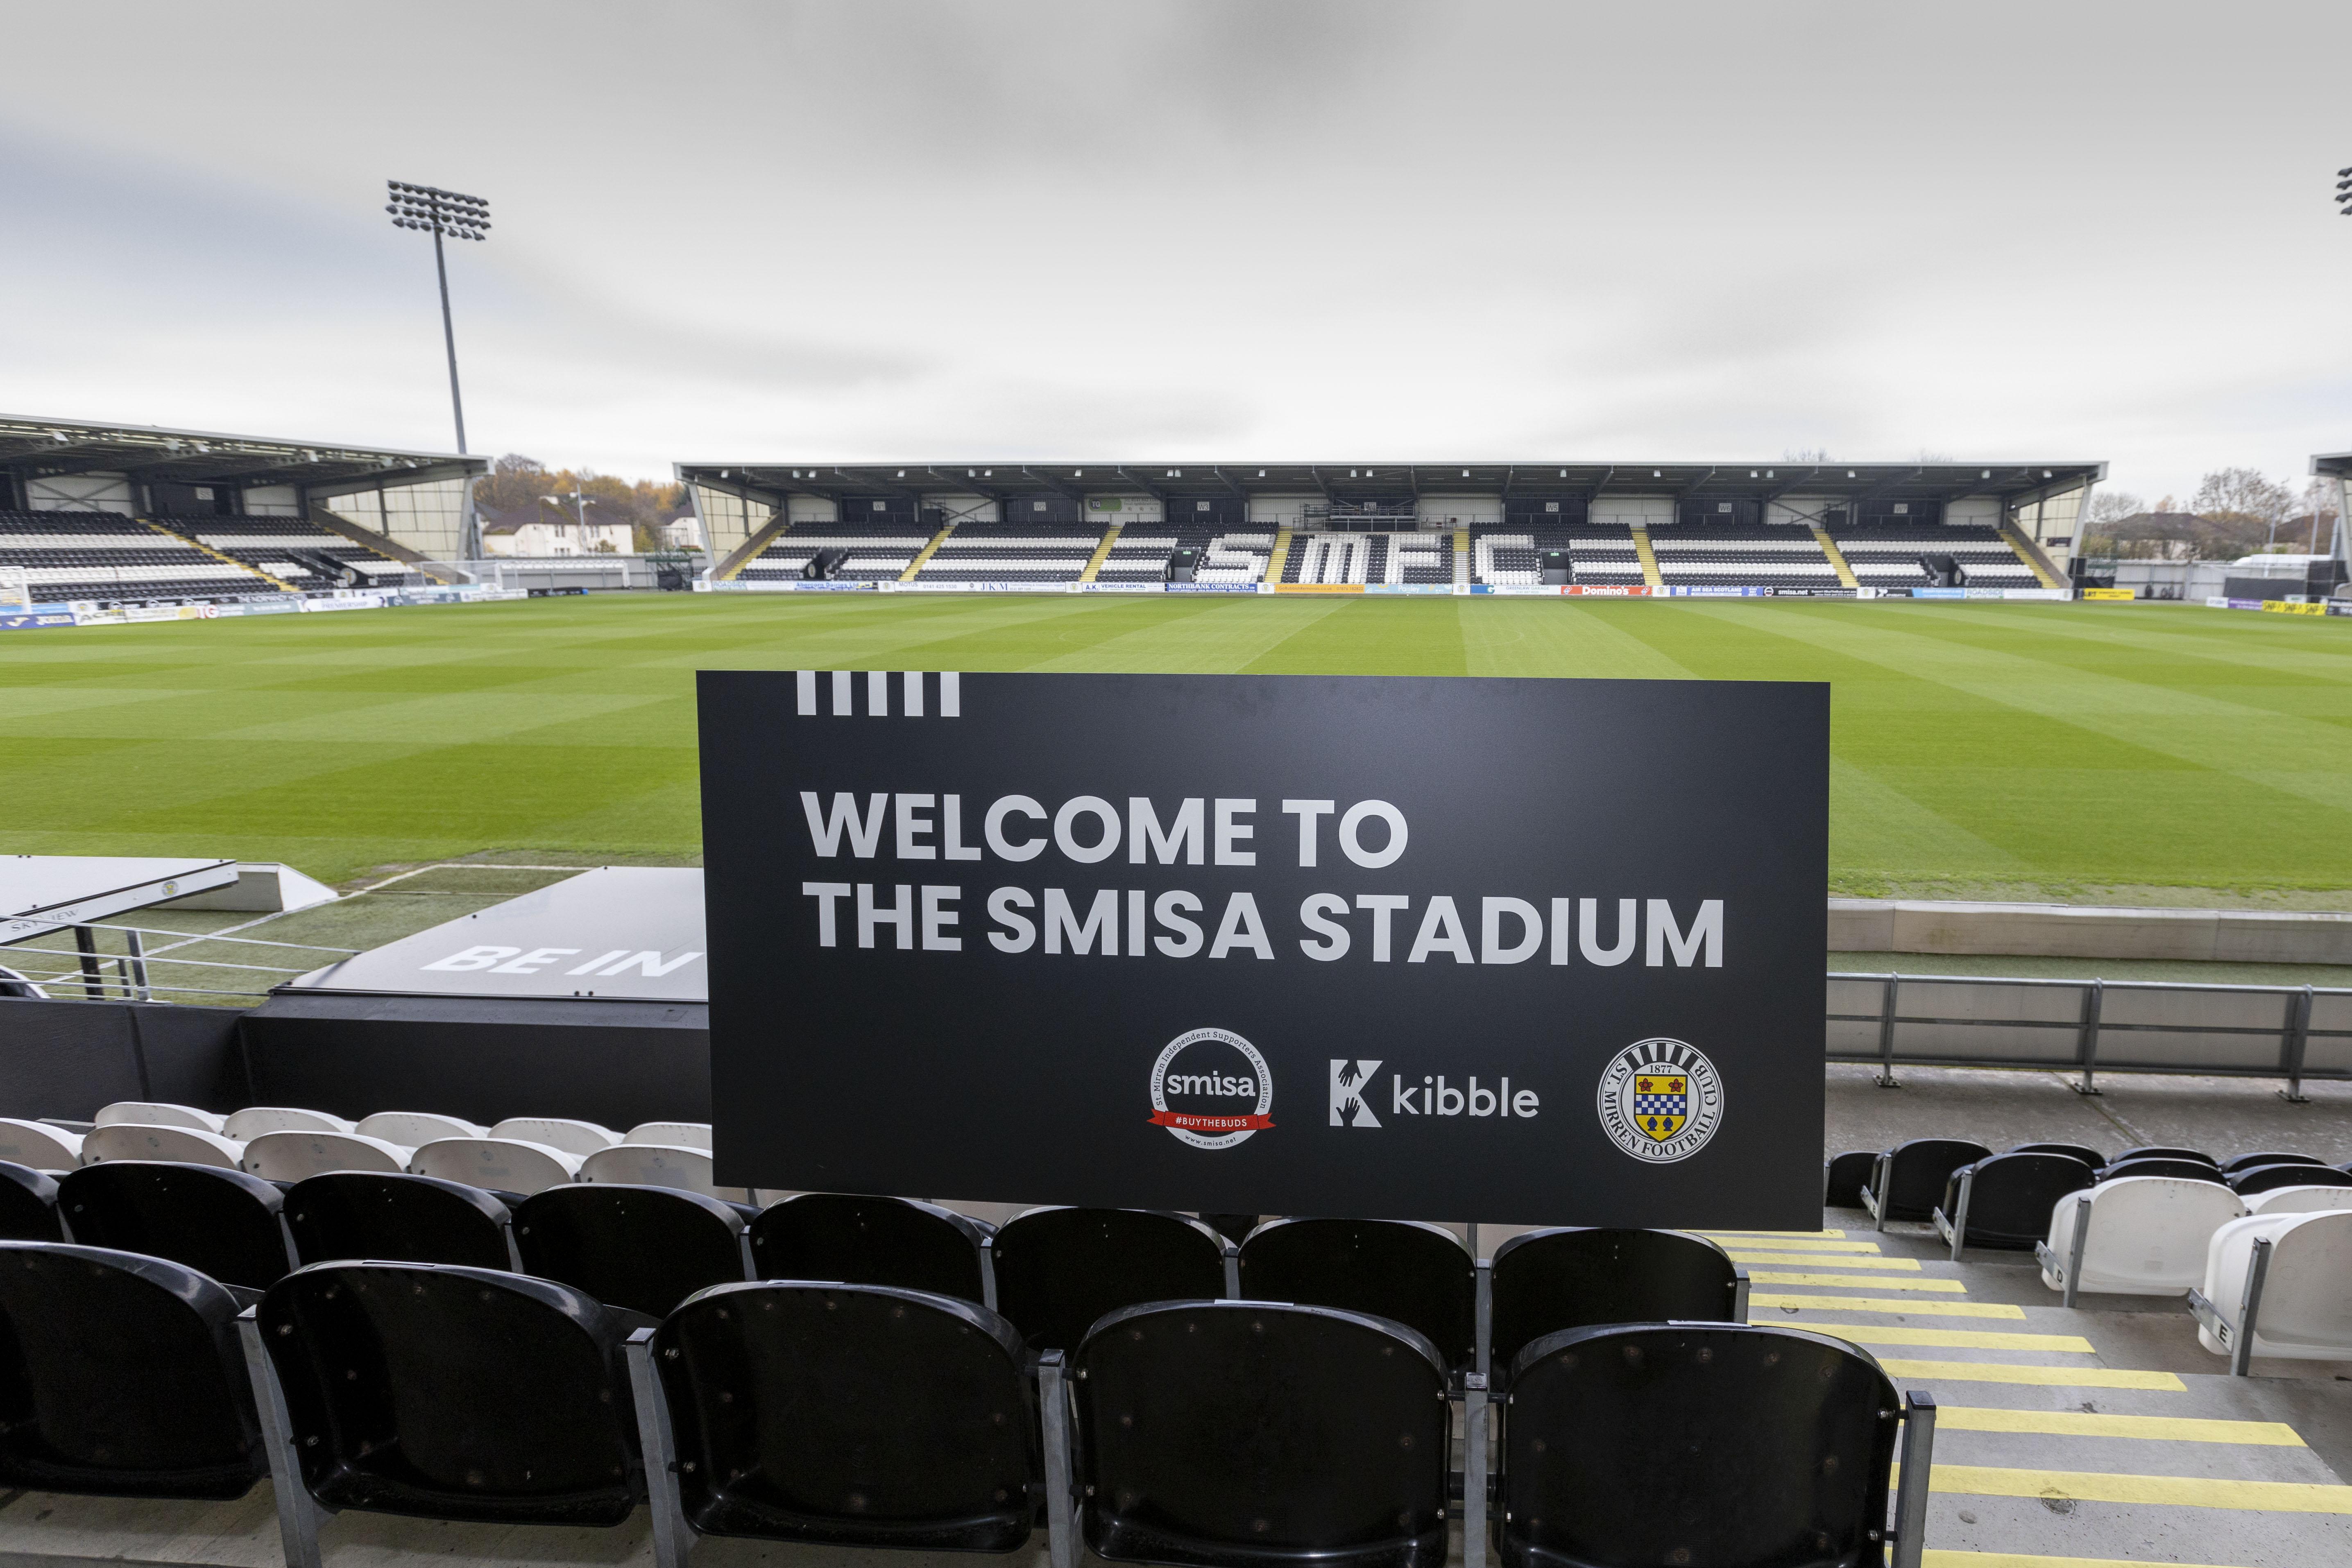 St Mirren Park to be renamed The SMISA Stadium